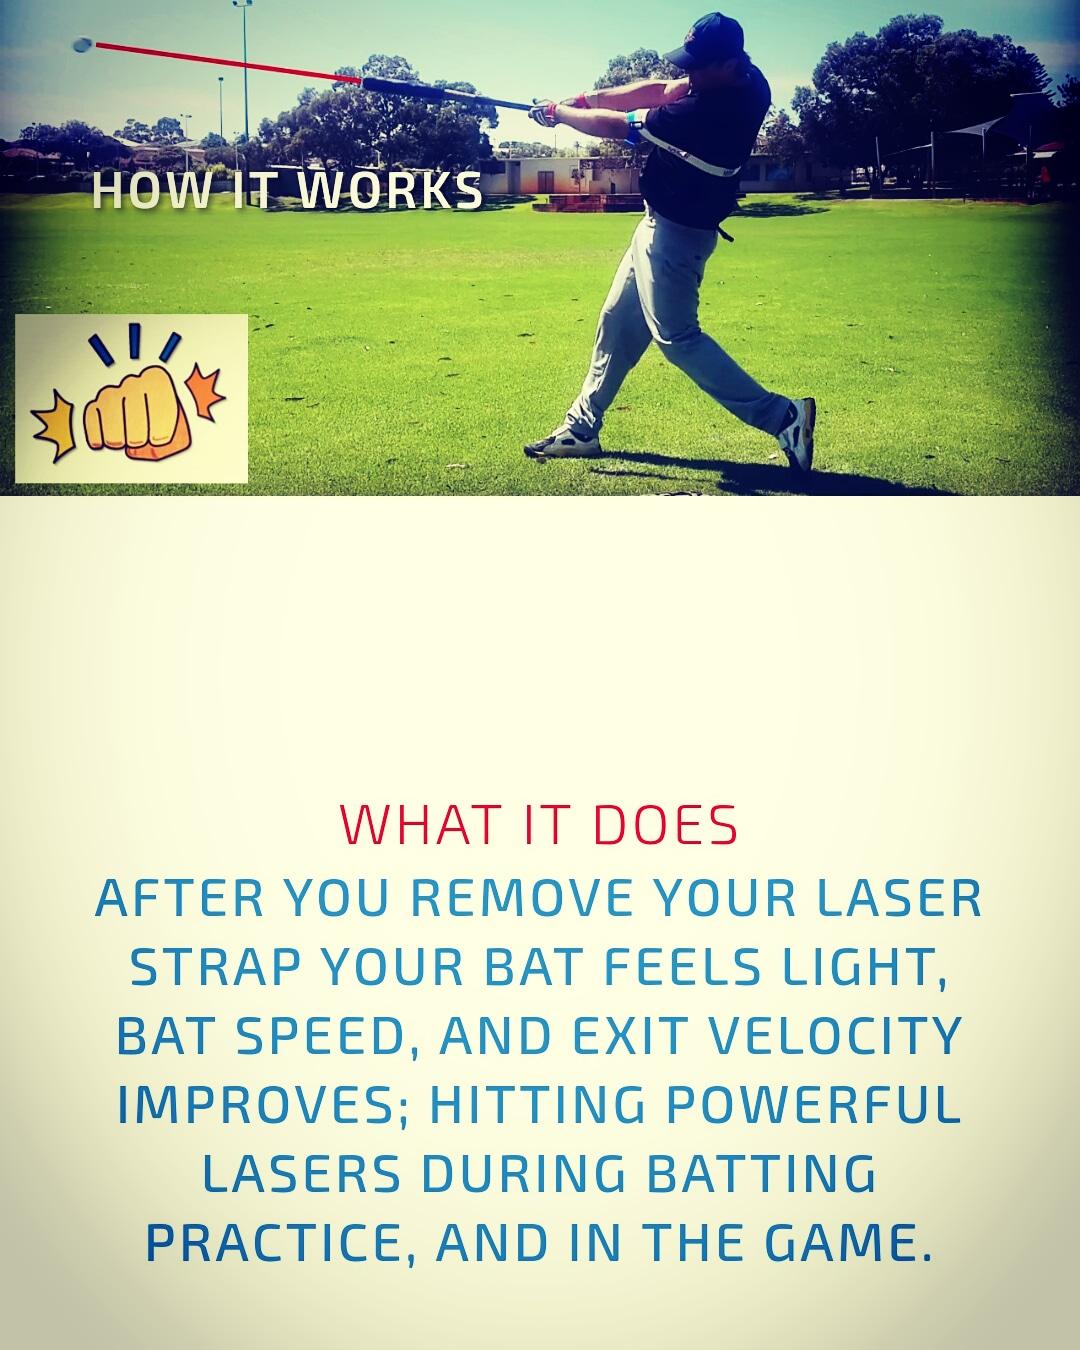 Laser Strap Power Hitting Aid